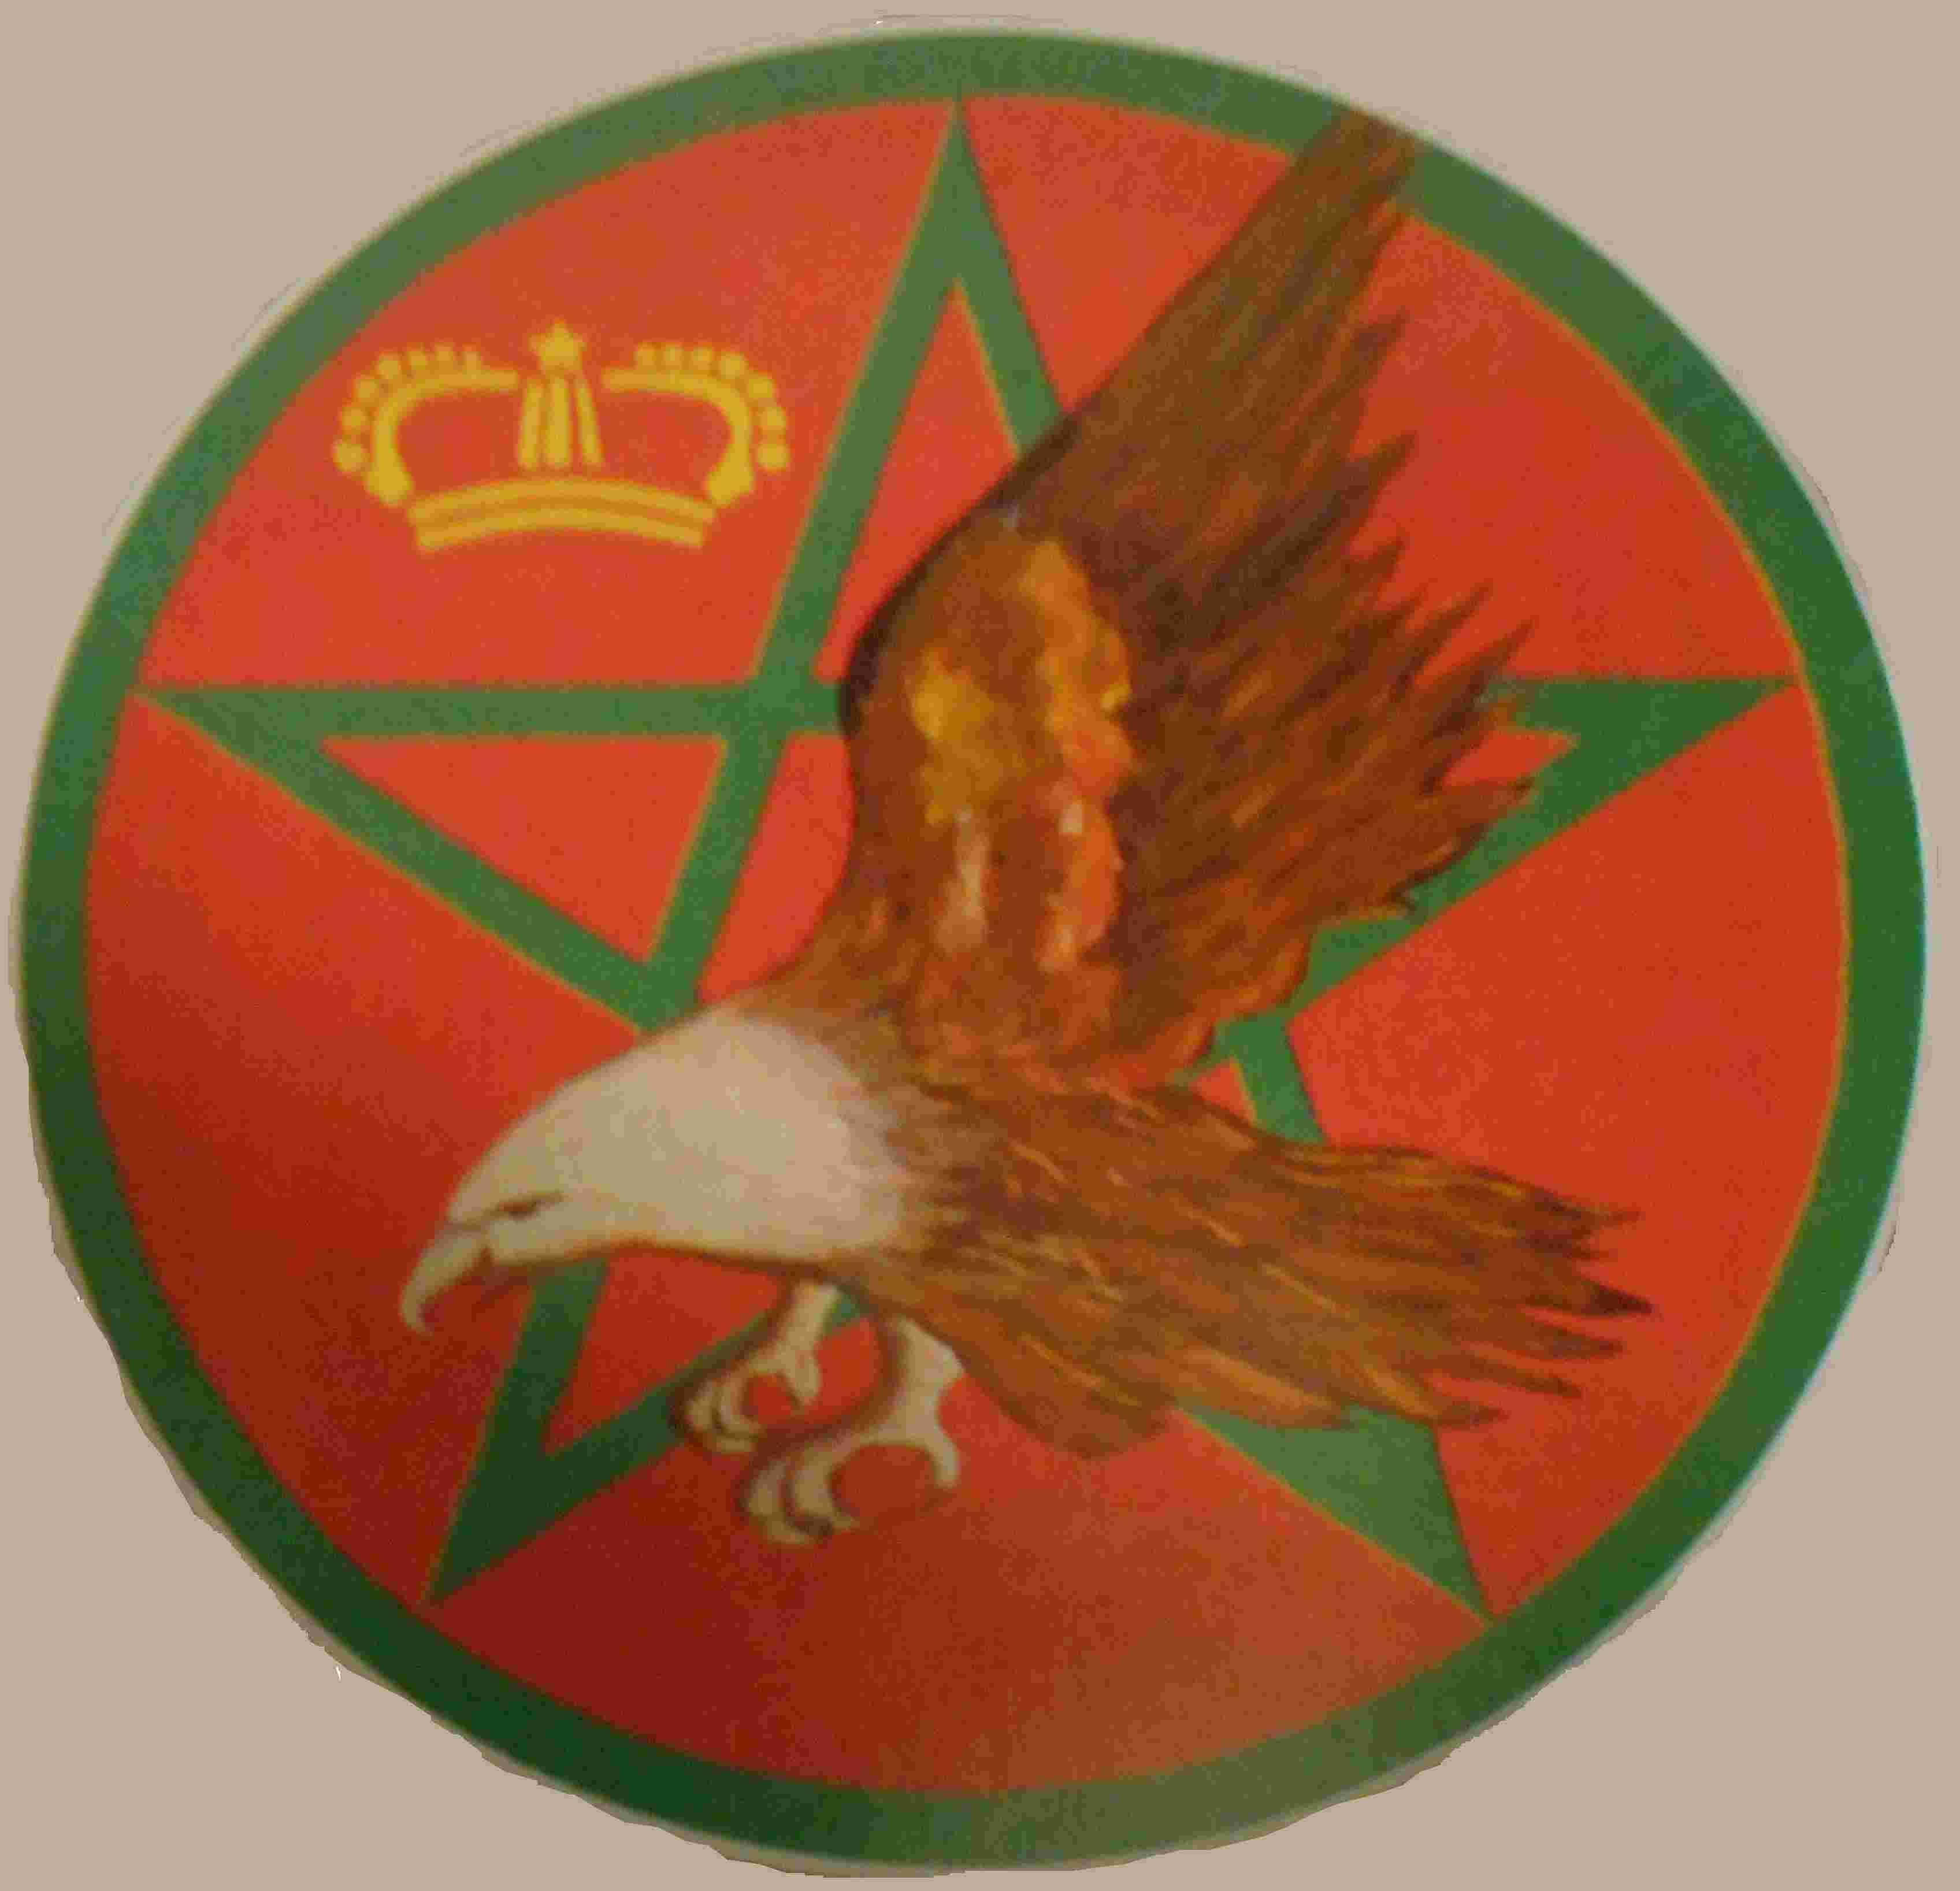 RMAF insignia Swirls Patches / Ecussons,cocardes et Insignes Des FRA - Page 5 Patch10